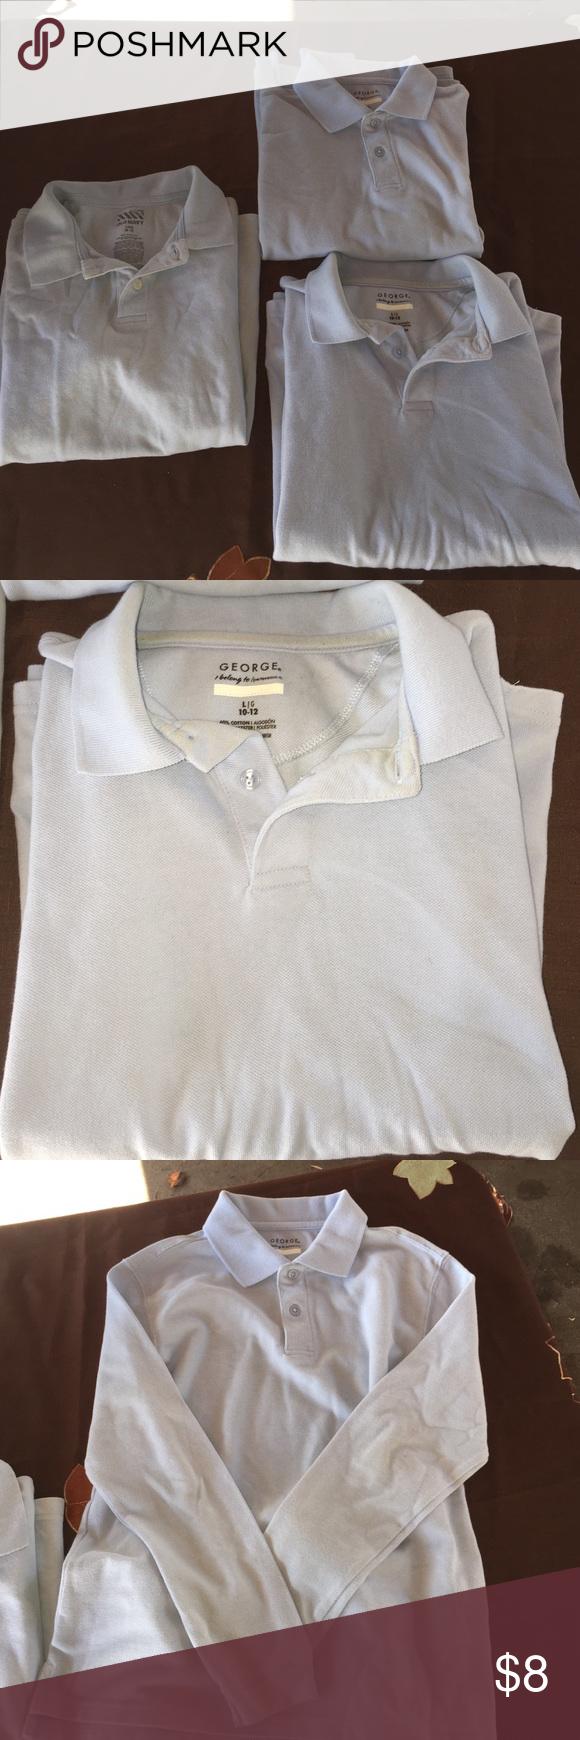 3 Pc Boys Sz 10/12 polo shirt 2 long slv & 1 short Pc Boys Sz 10/12 polo shirt 2 long slv & 1 short Baby Blue Bundle Shirts & Tops Polos